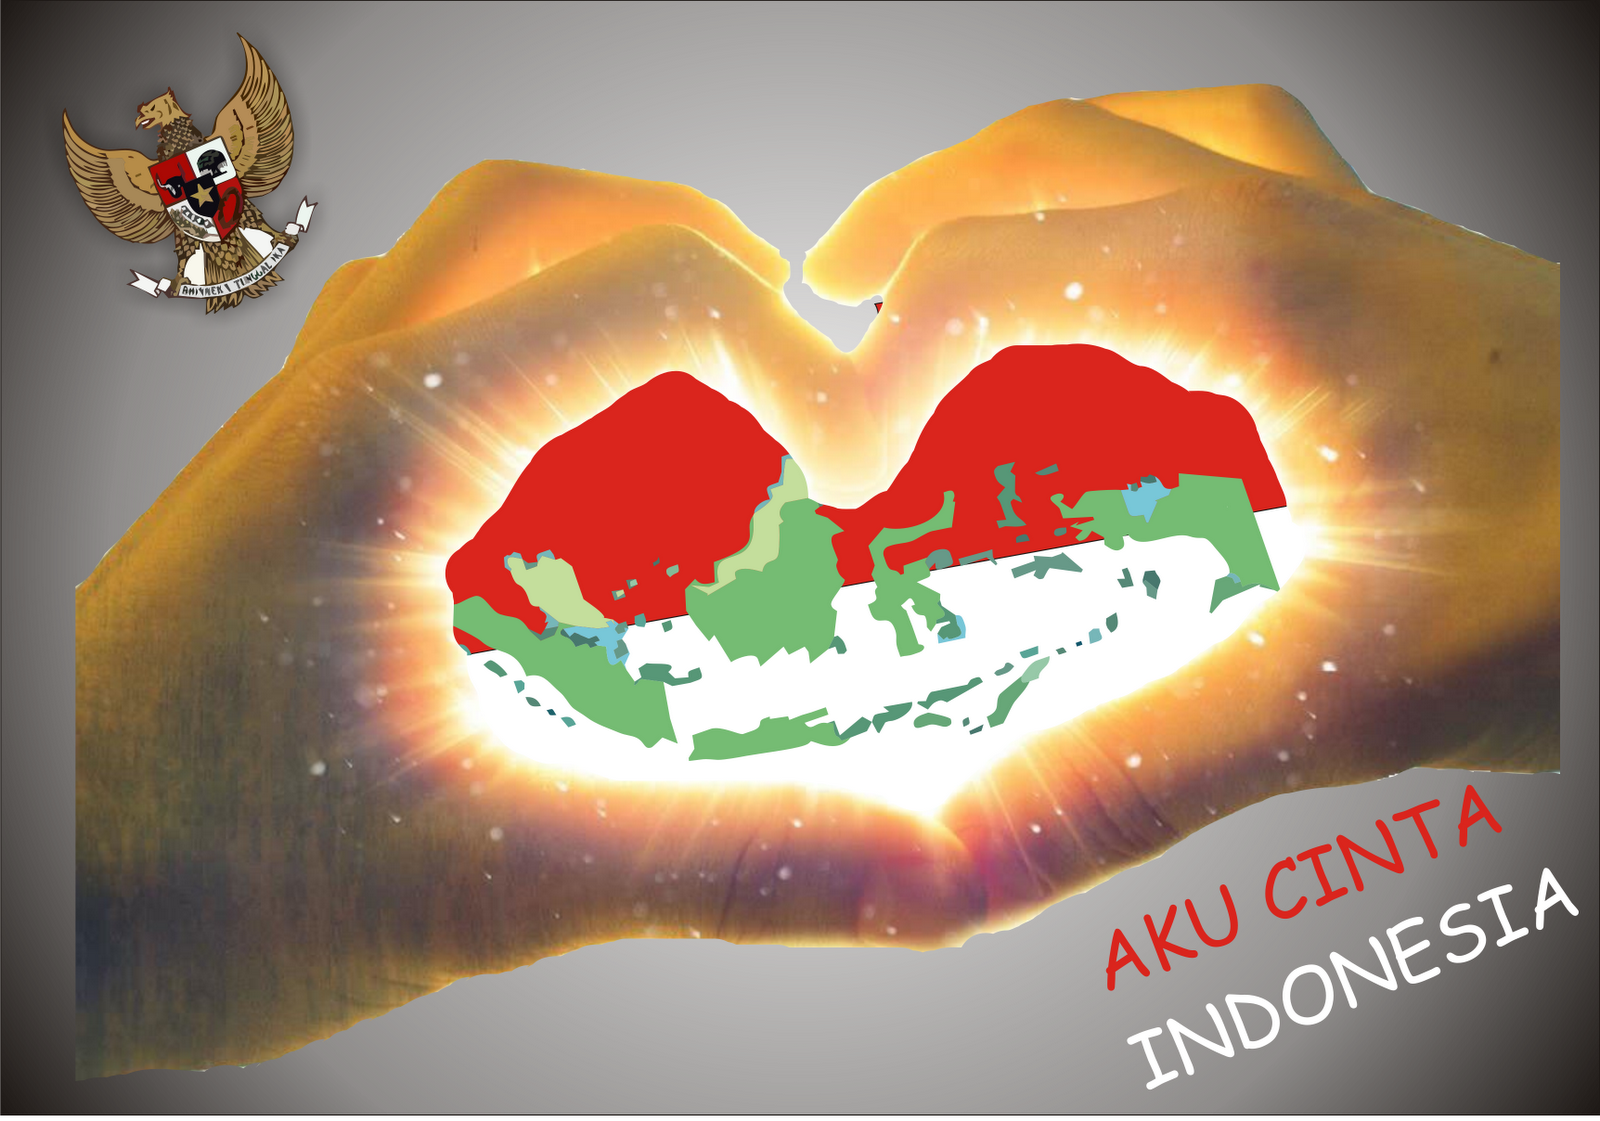 https://1.bp.blogspot.com/-skd1yiykg1w/WY0m7J-b9DI/AAAAAAAACDk/mOT6VpmSFmo9DQ9xffYh9DHRX5bznWYNgCLcBGAs/s1600/10-37-49-cinta-indonesia.png